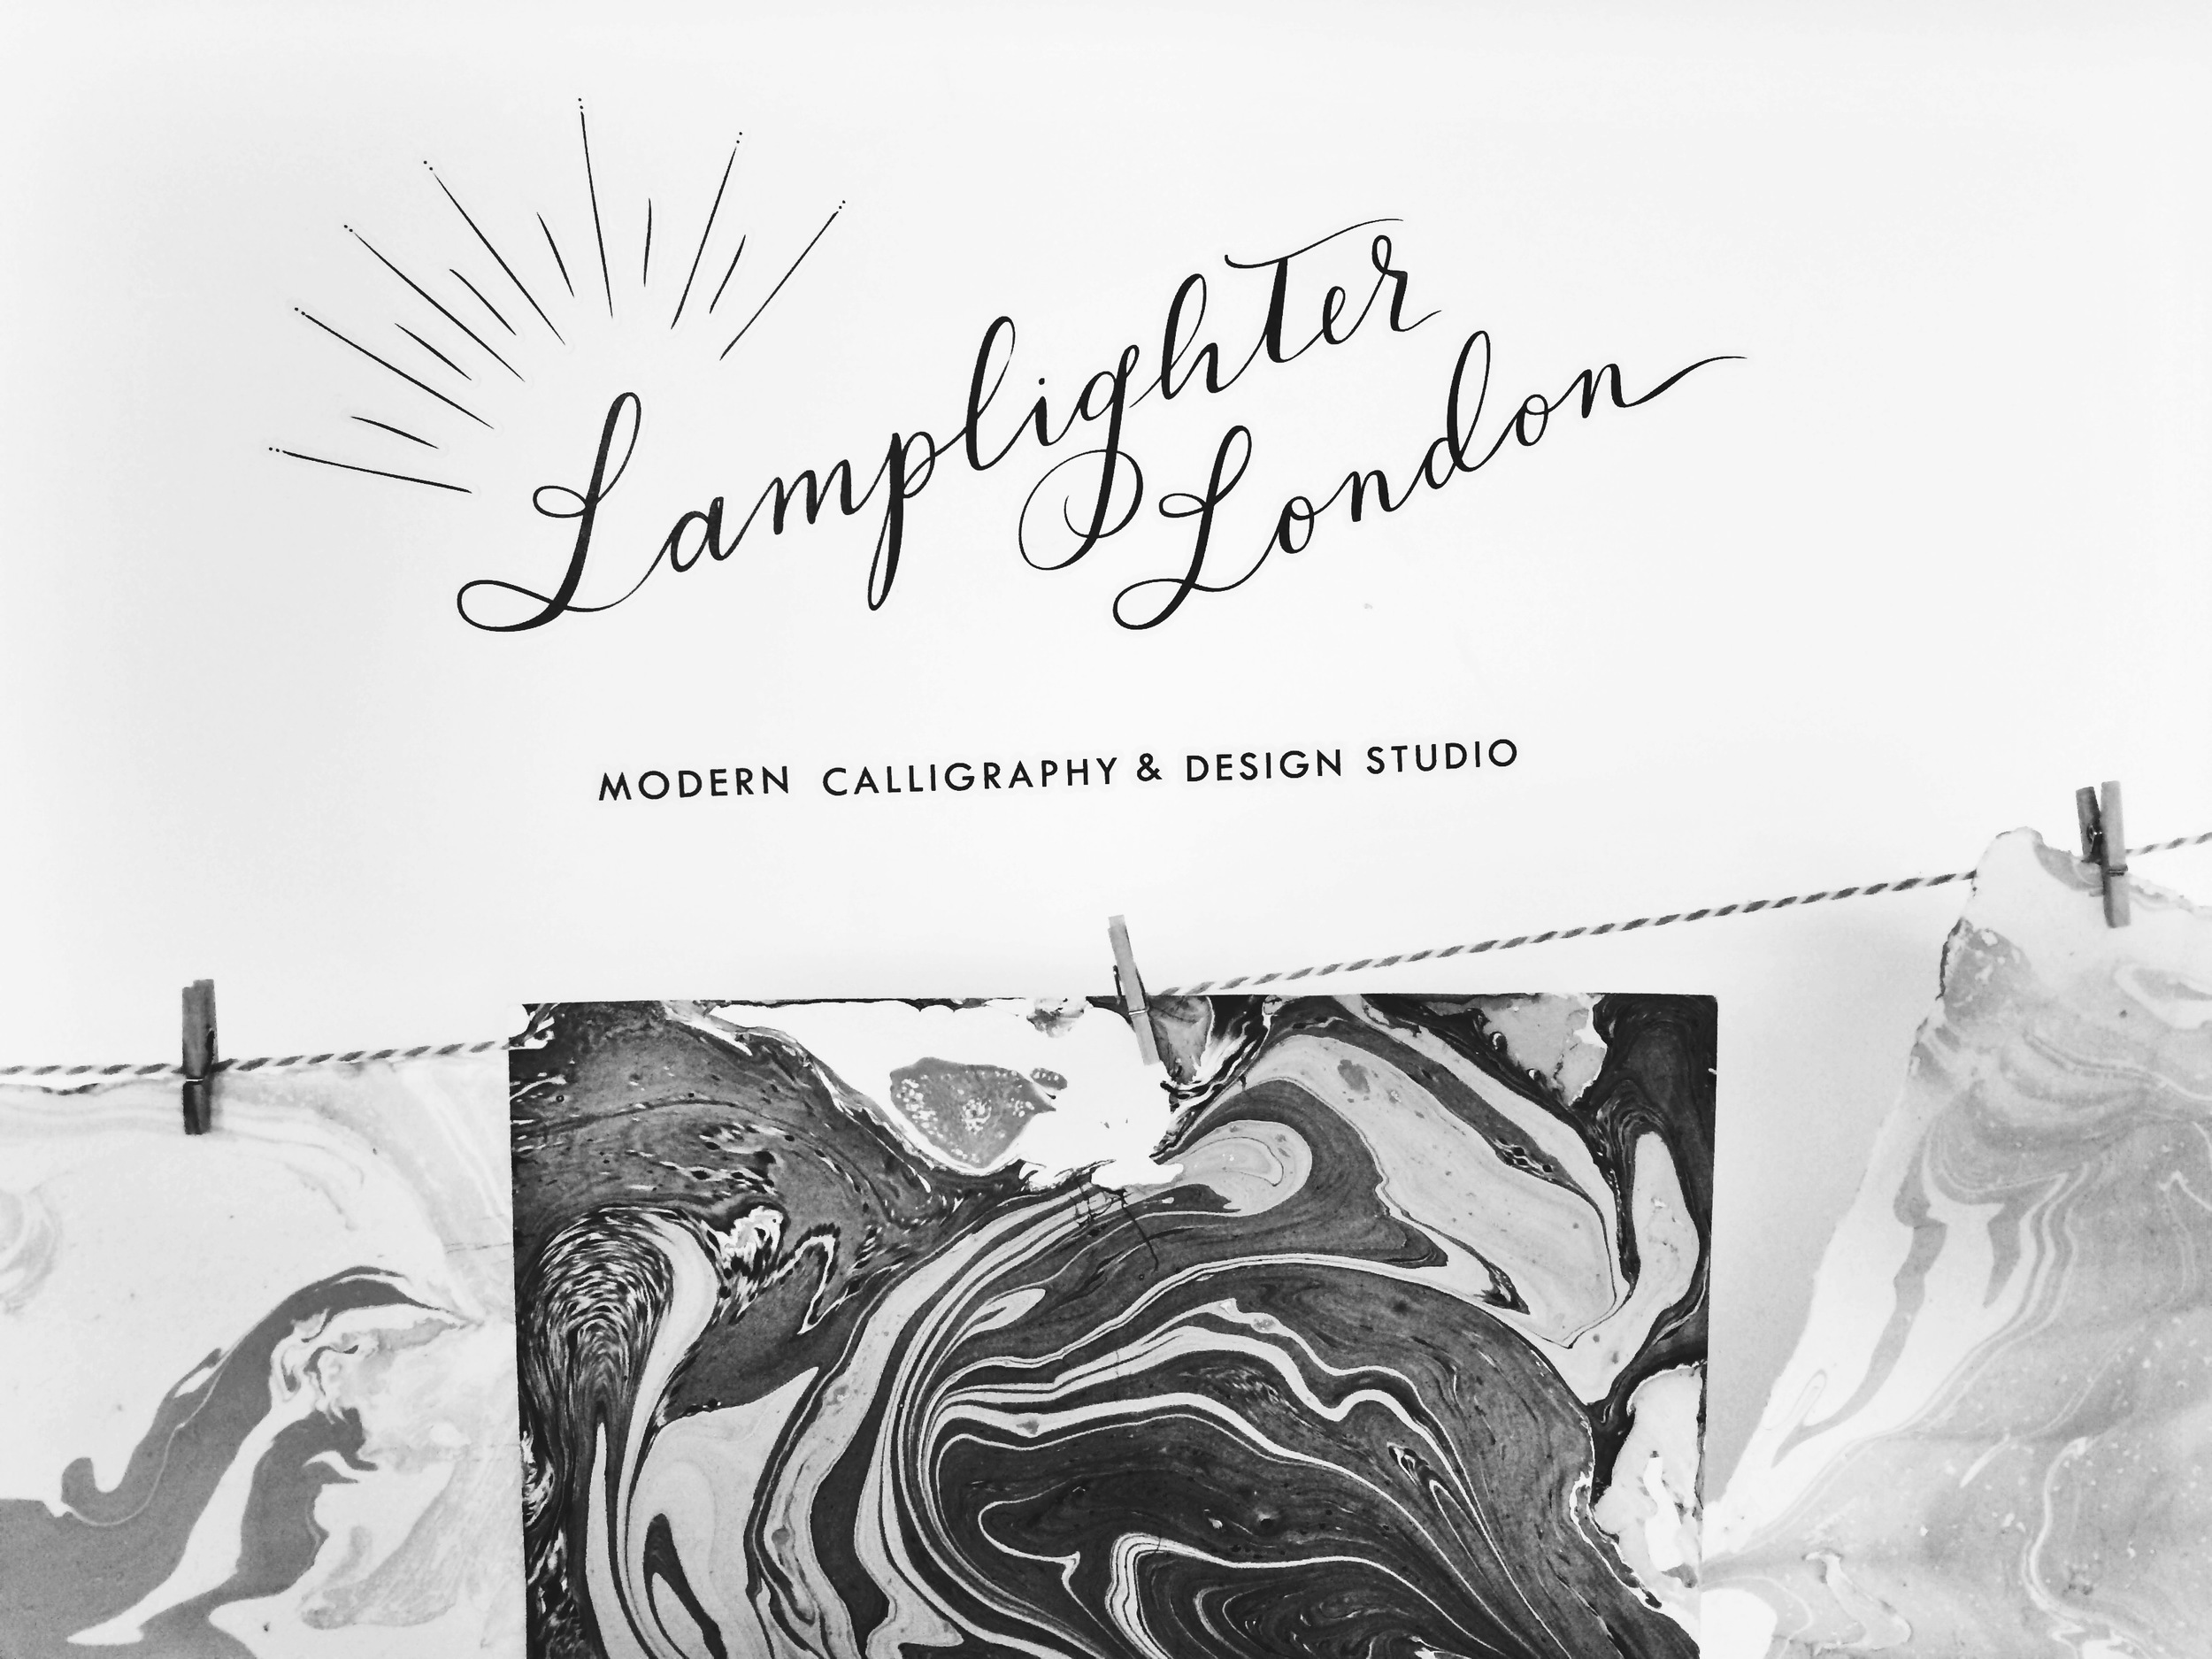 Lamplighter London | Modern Calligraphy & Design Studio